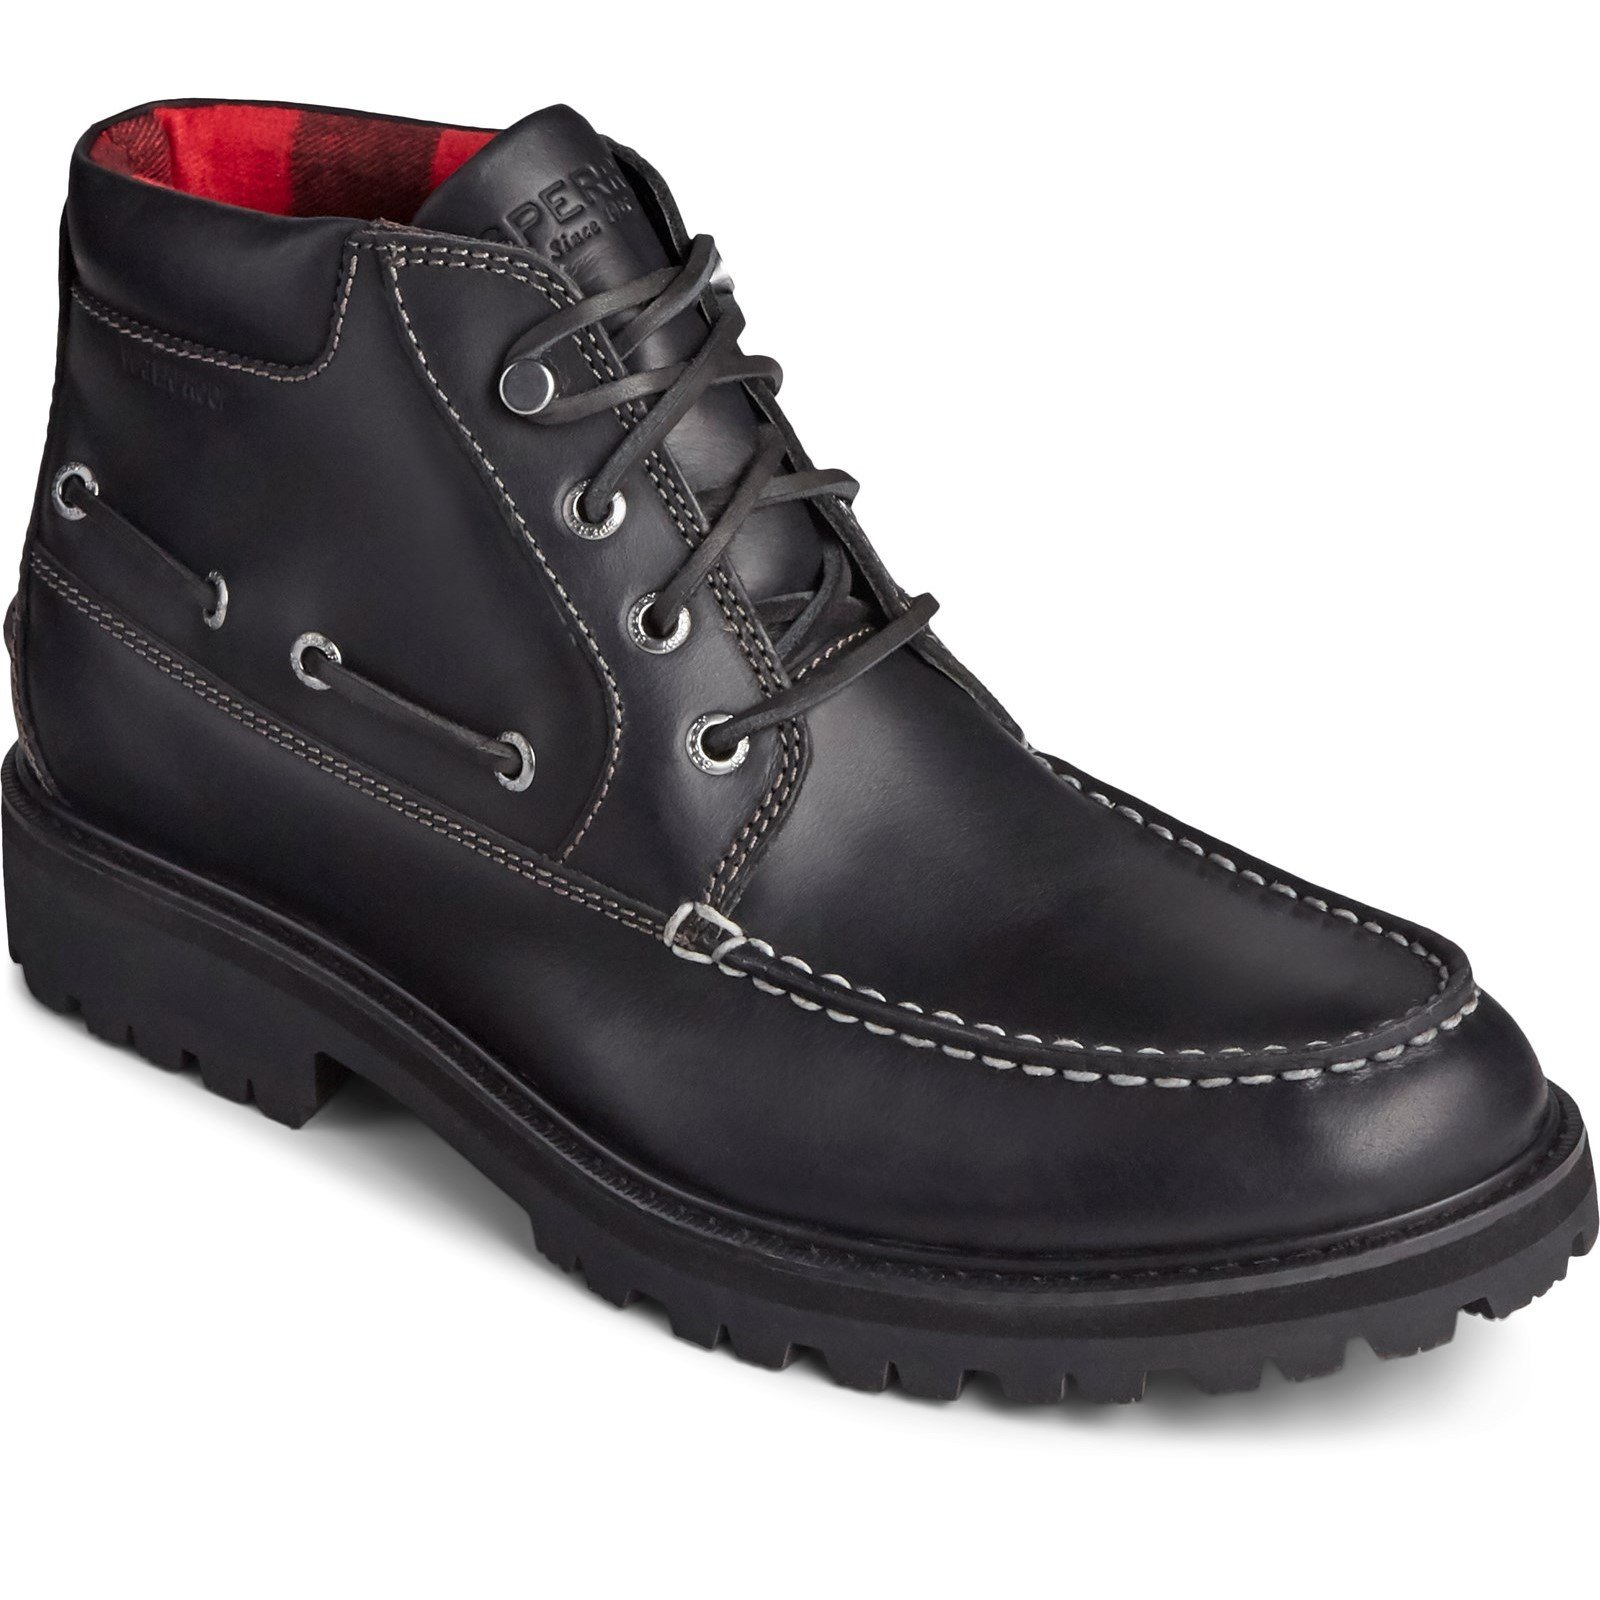 Sperry Men's Authentic Original Lug Chukka Boot Various Colours 32068 - Black 12